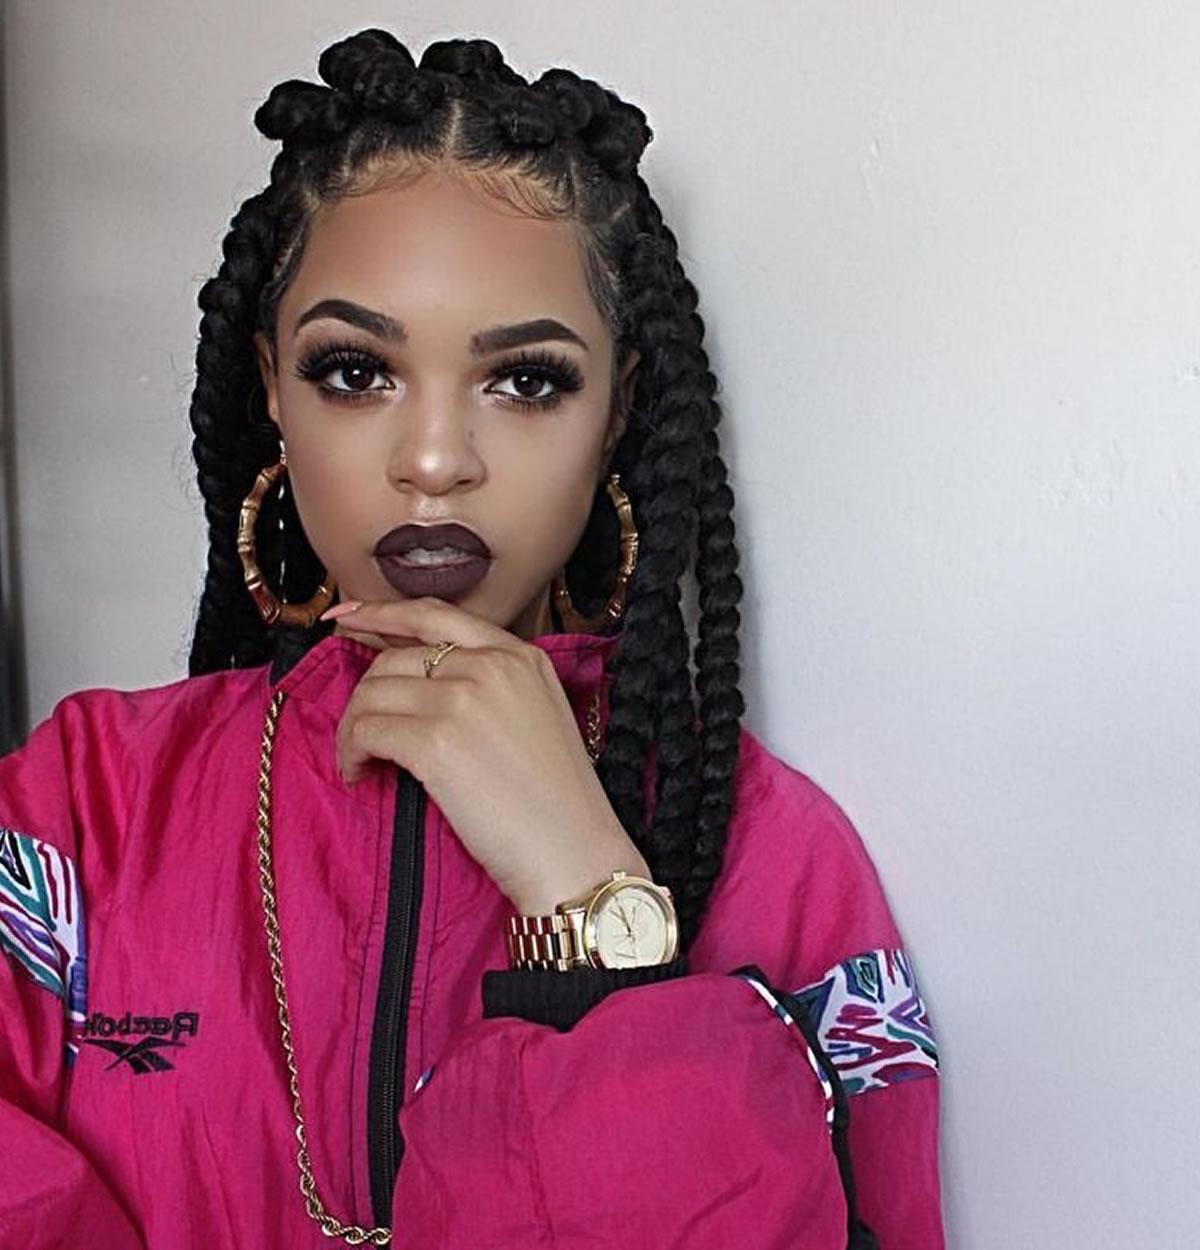 Short, Medium And Long Hair Ideas & Hairstyles For Black Women 2018 Regarding 2017 Black Woman Medium Haircuts (View 6 of 20)